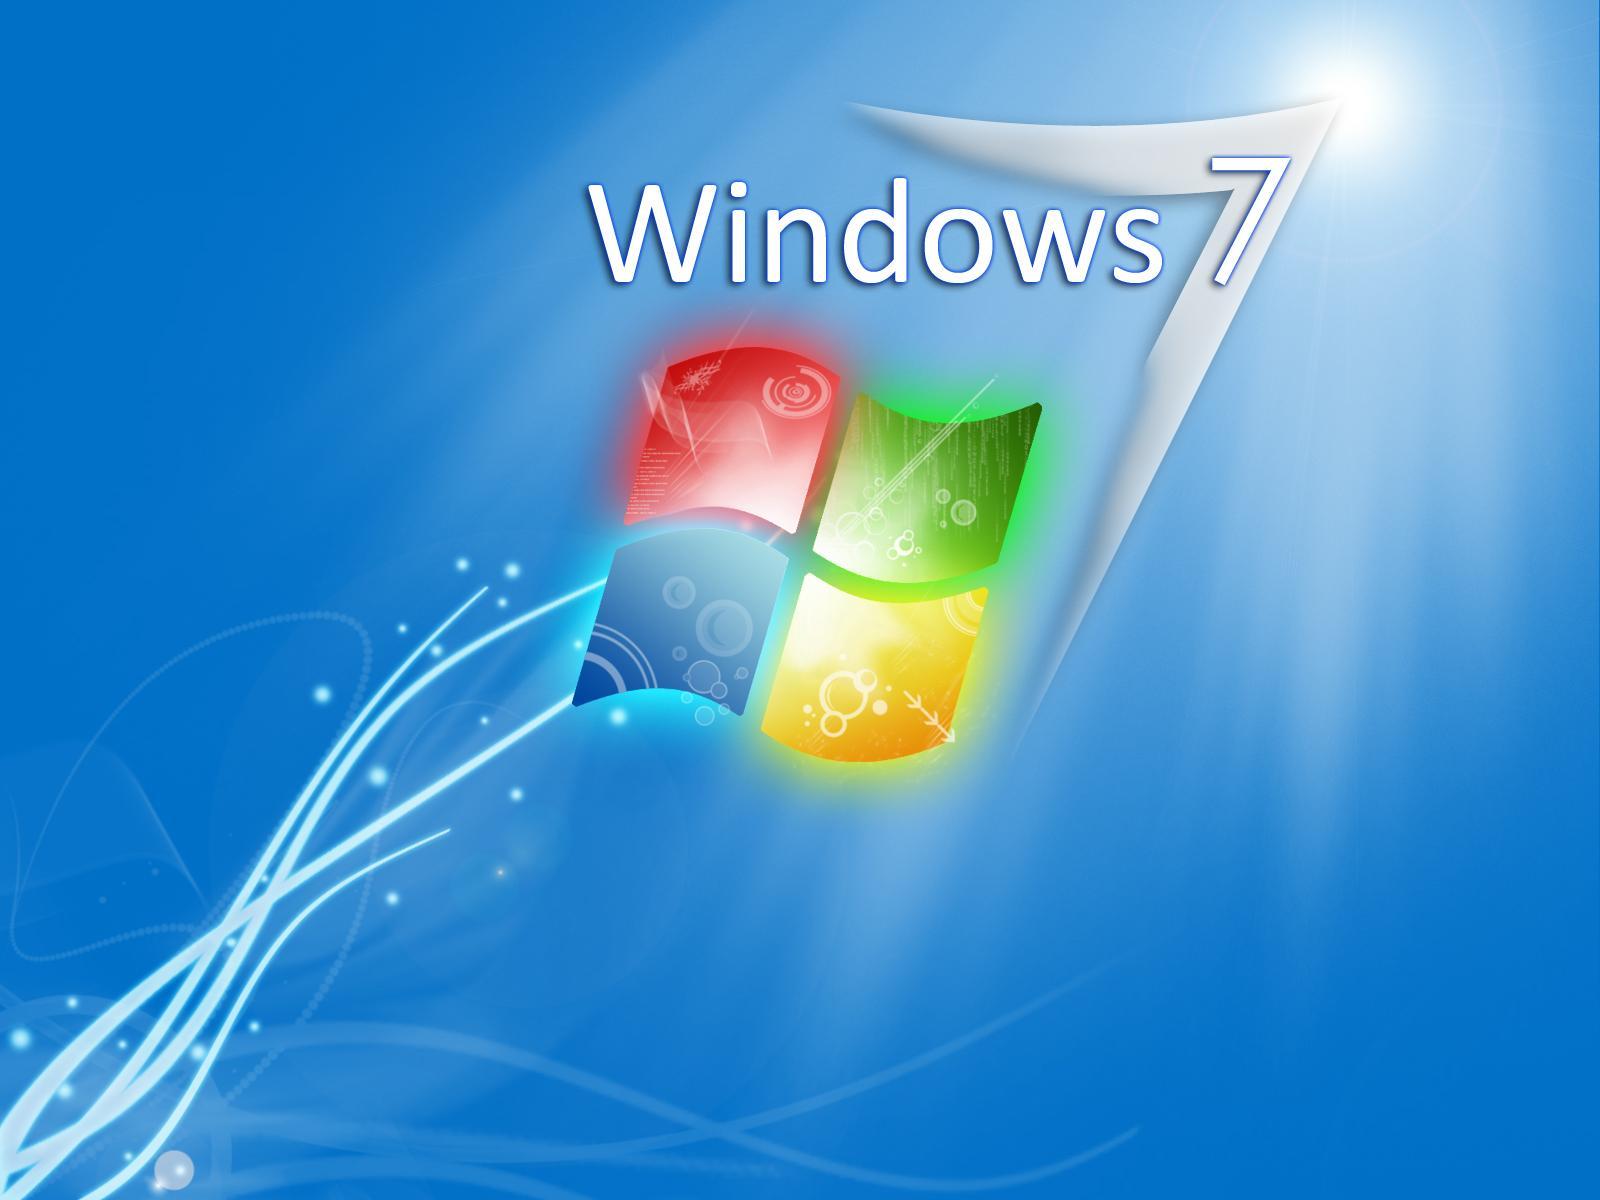 Wallpaper Bergerak Windows 7 Ultimate 48 Windows